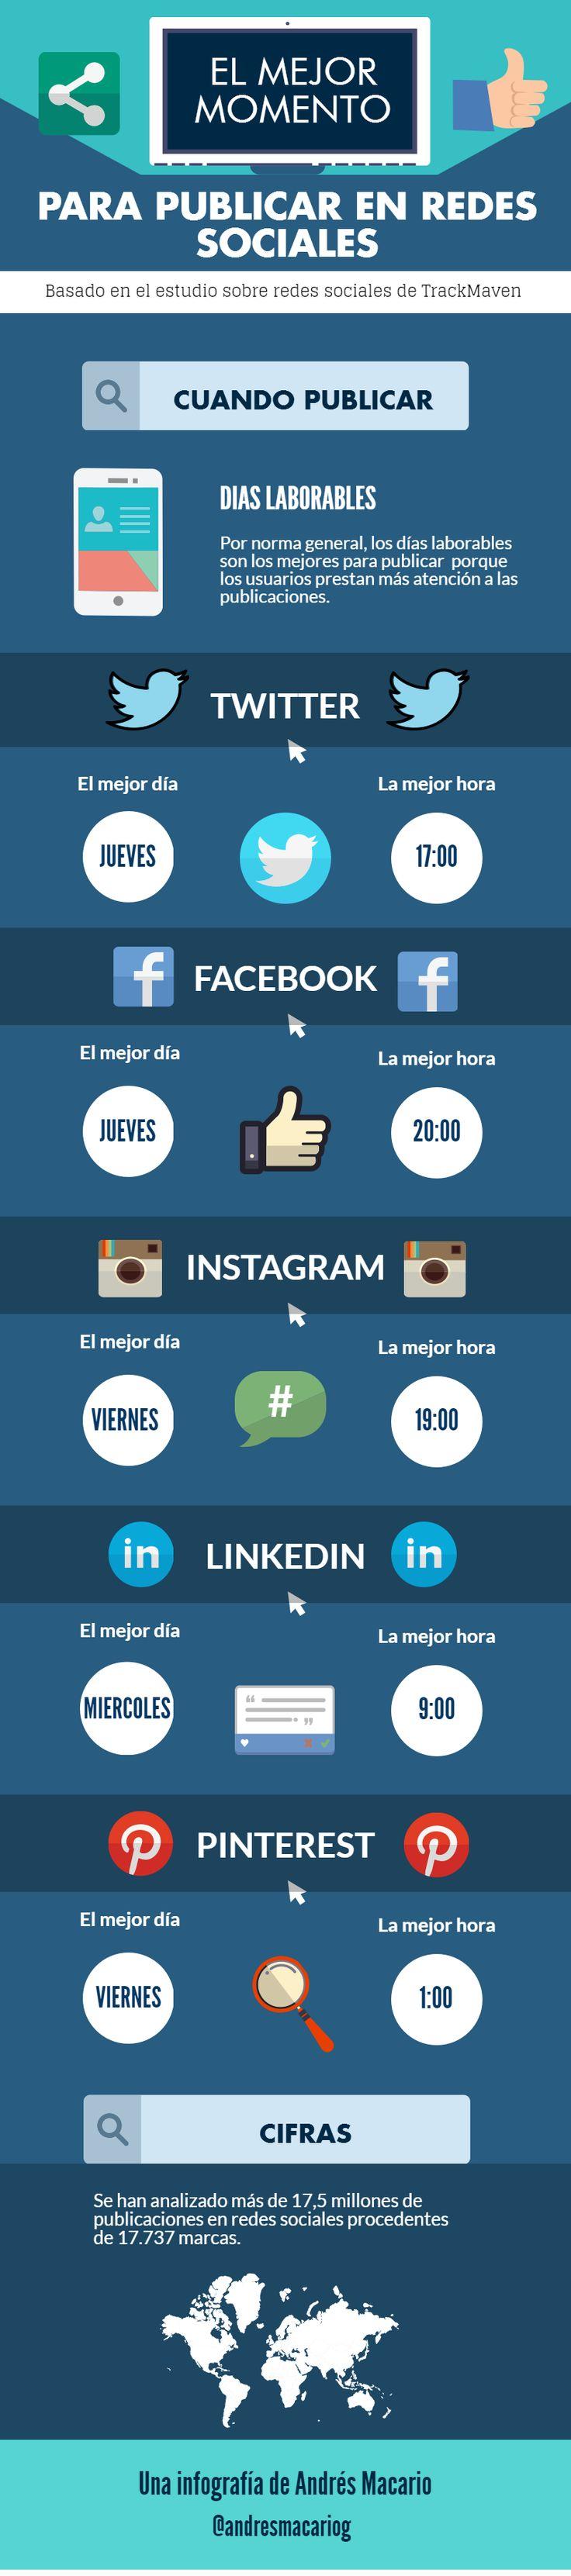 El mejor momento para publicar en redes sociales #infografia http://giovannibenavides.com/the_creator/